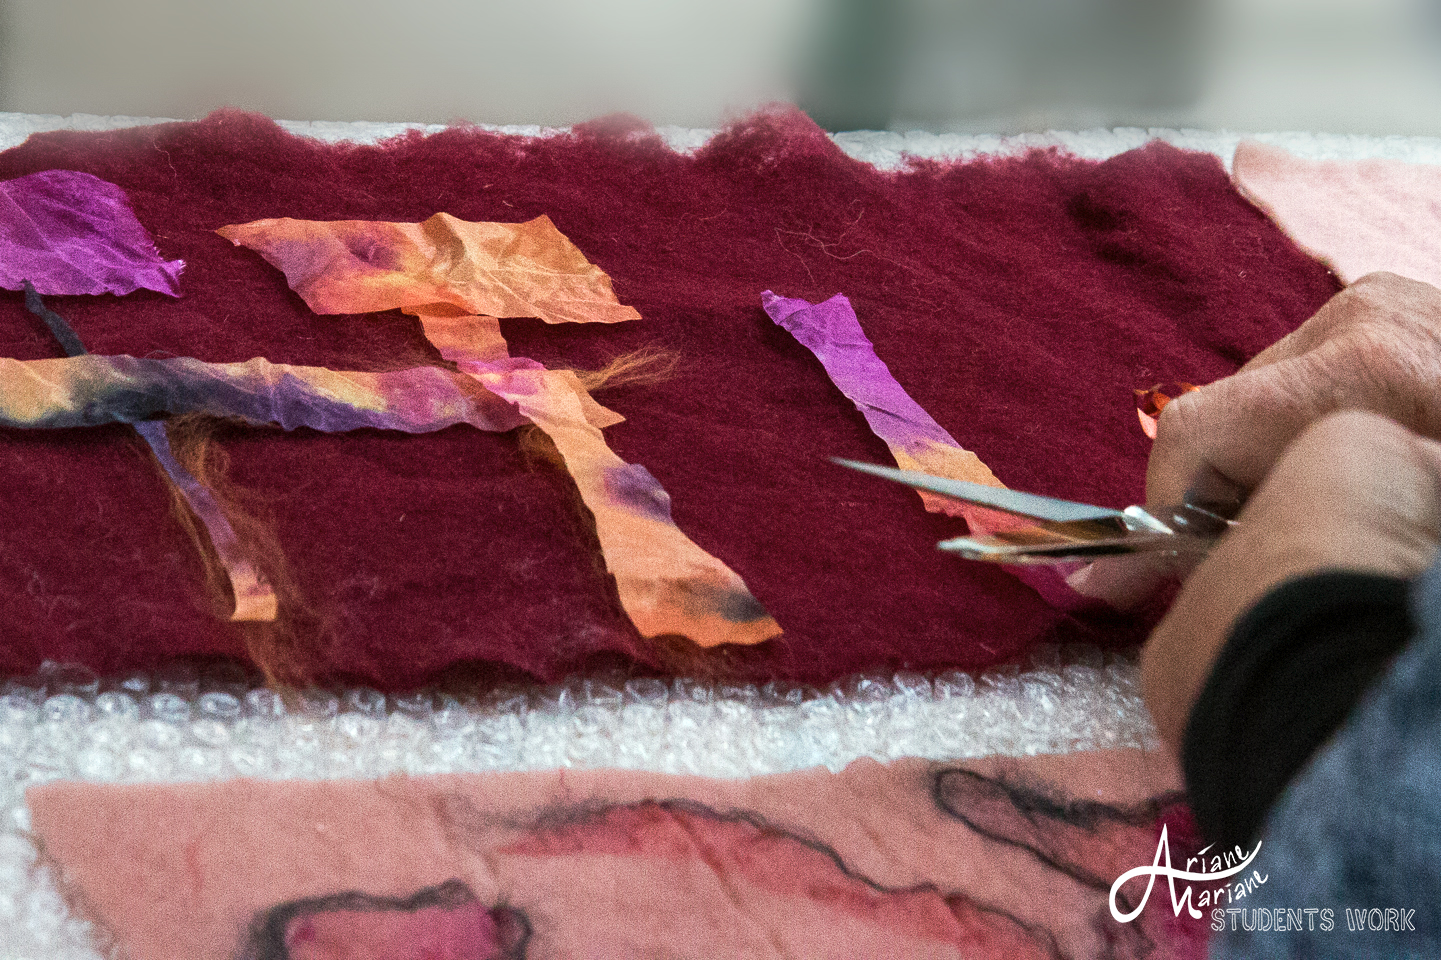 workshops-ariane-mariane-feltrosa-8010.jpg